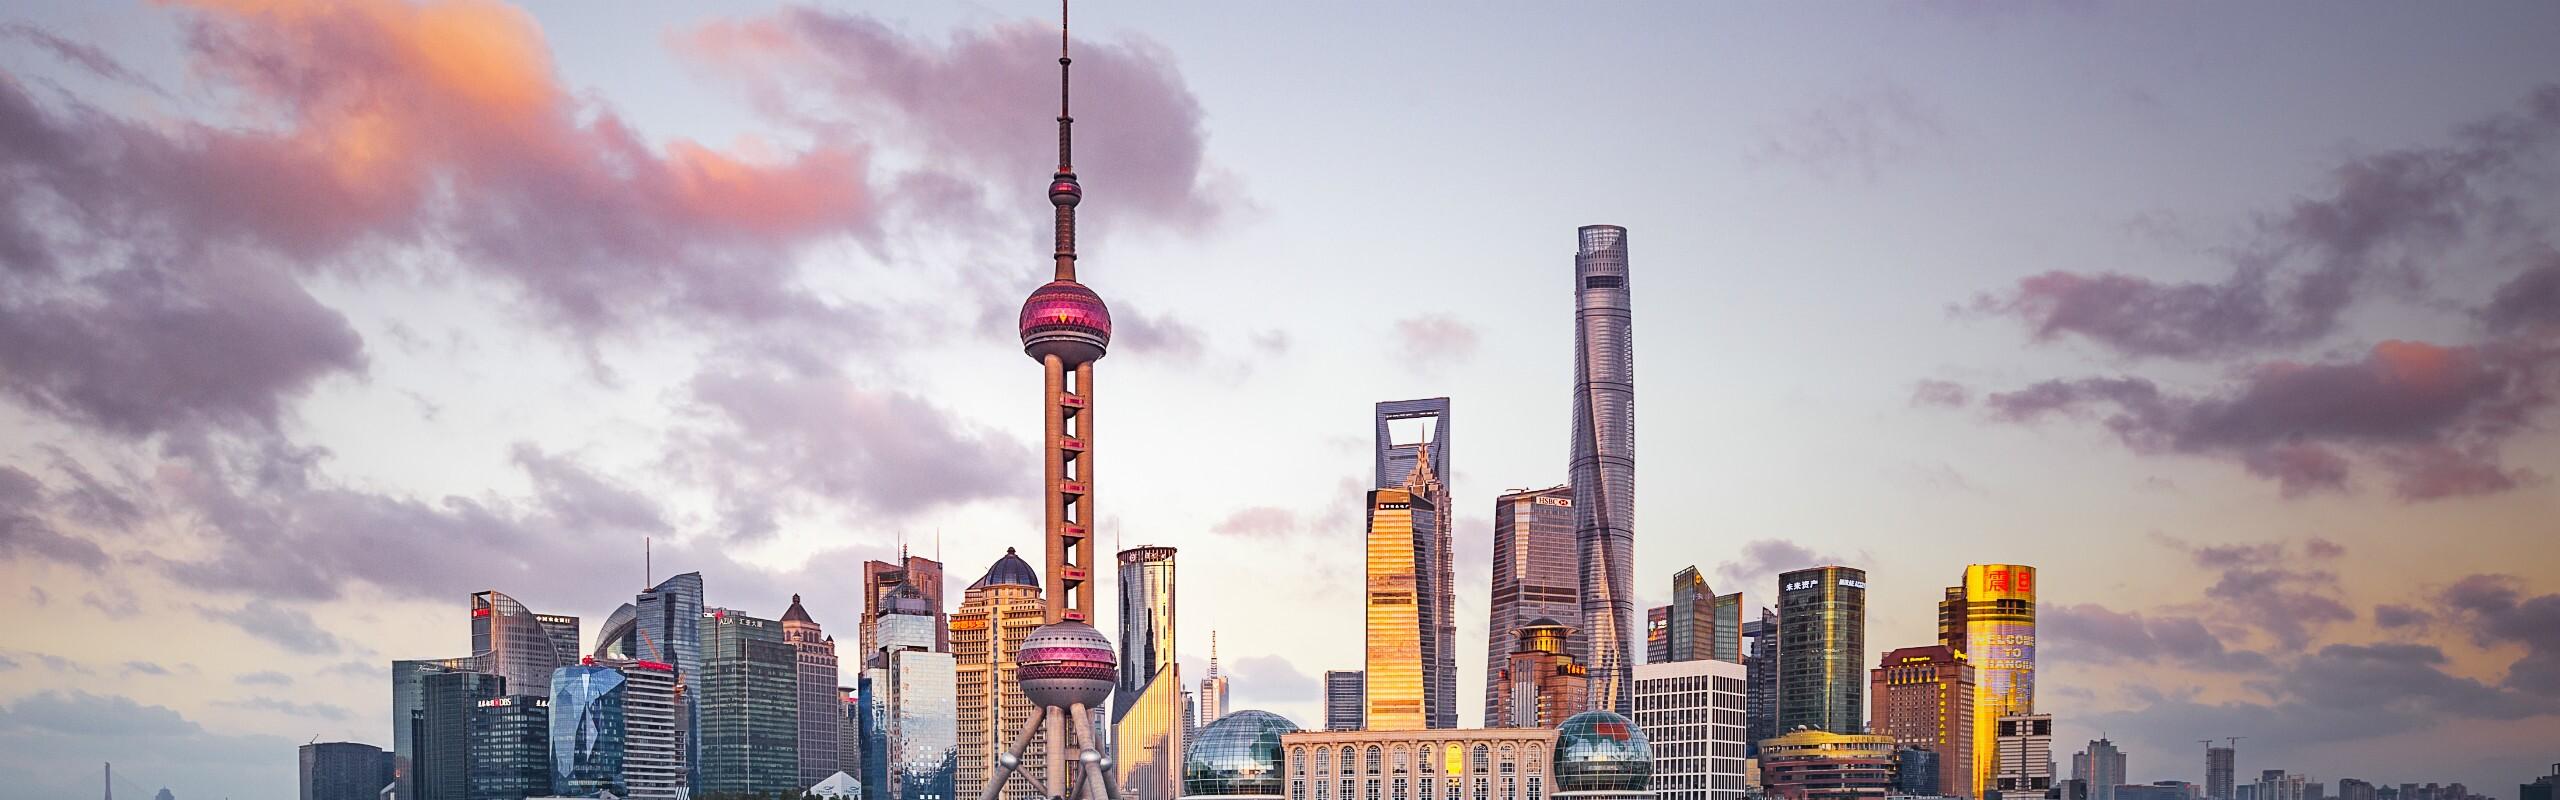 10 Top East China Tours